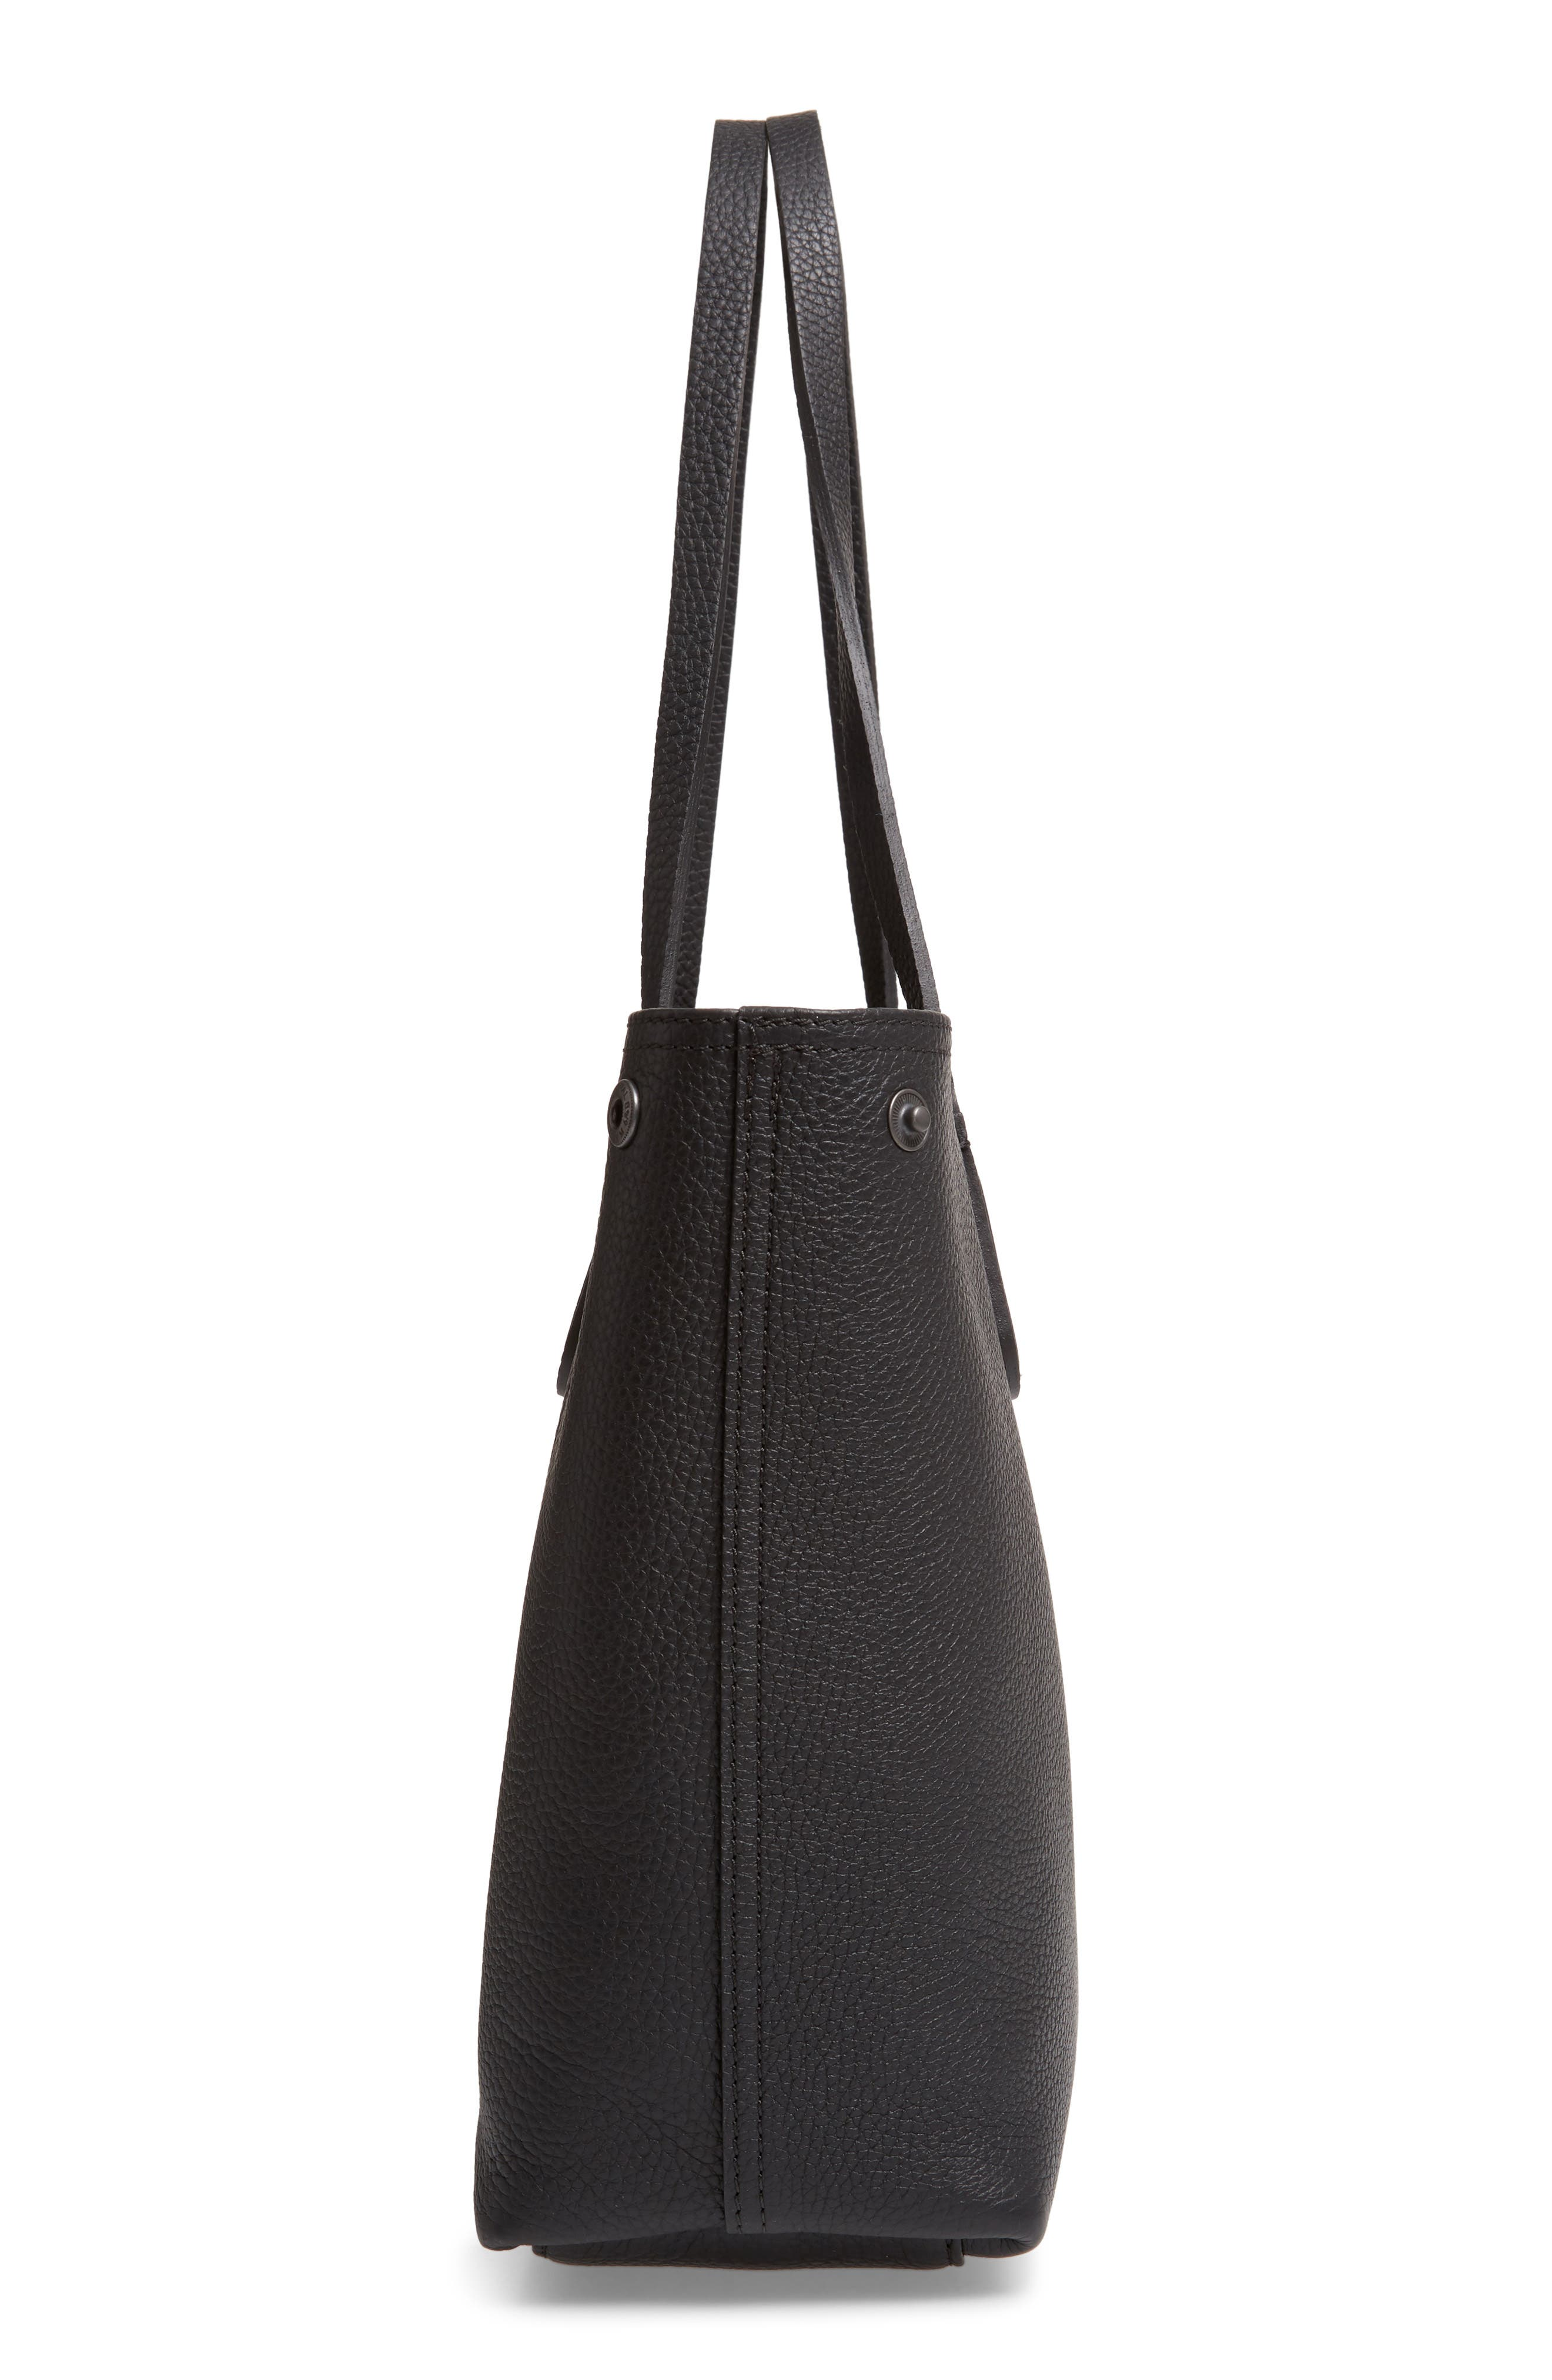 LONGCHAMP, Roseau Essential Mid Leather Tote, Alternate thumbnail 7, color, BLACK